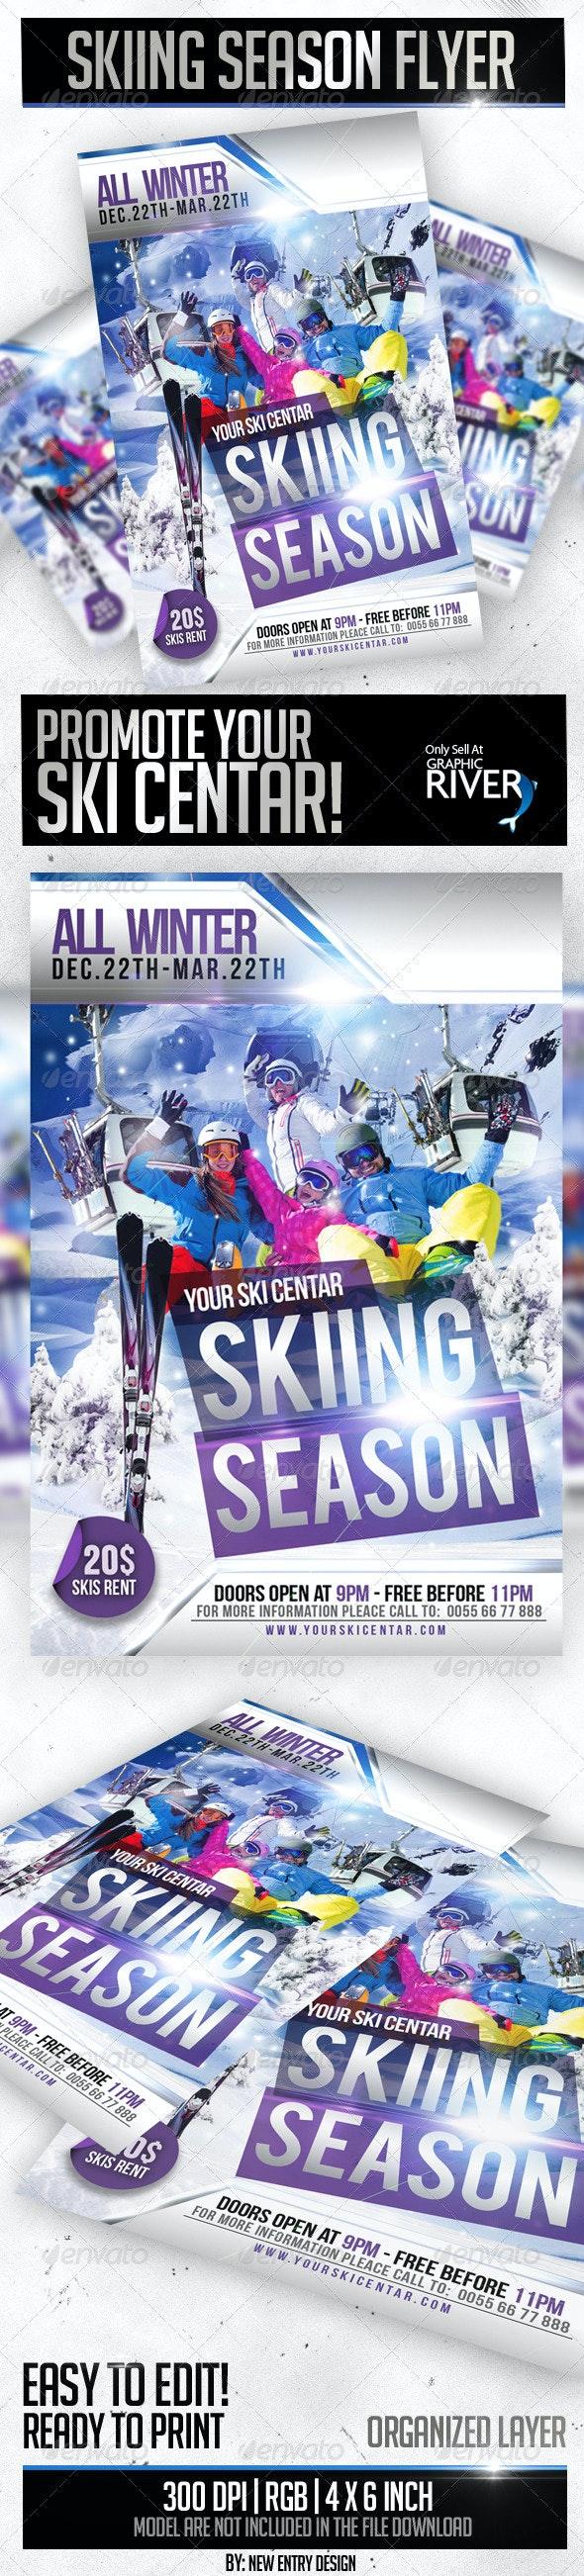 Skiing Season Flyer Template - Flyers Print Templates